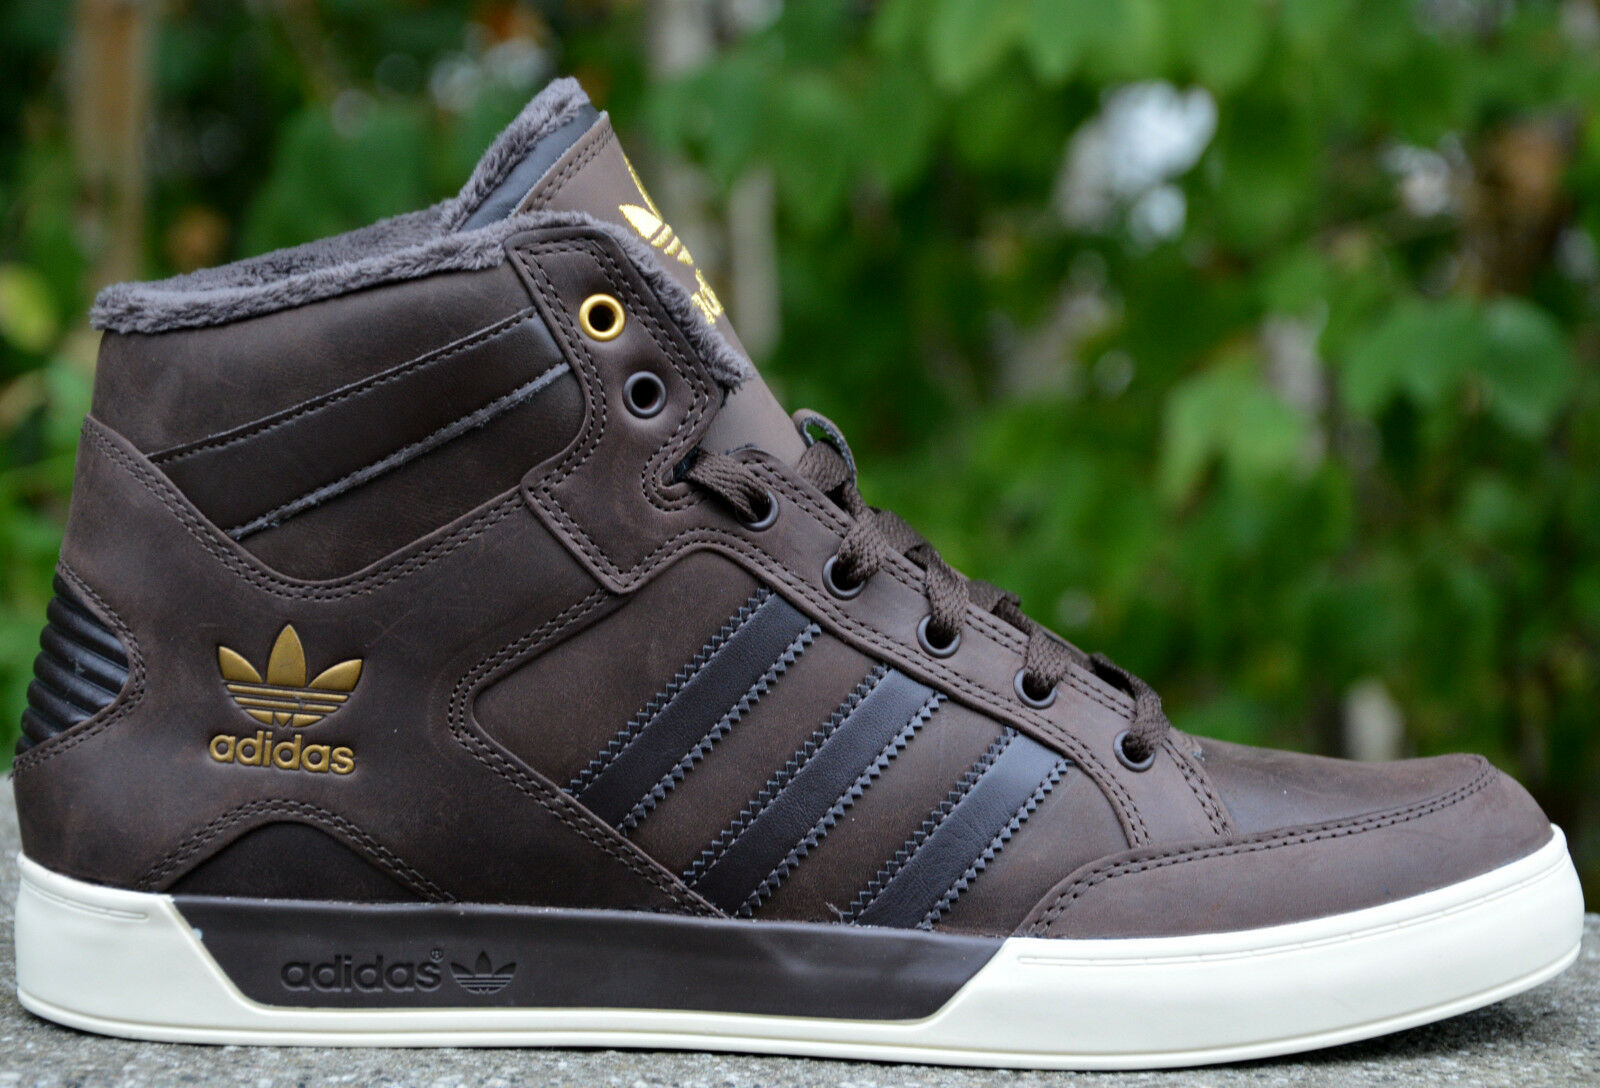 Adidas Hardcourt Hi Herrenschuhe Turnschuhe High Top  Herbst Sneaker Big Logo